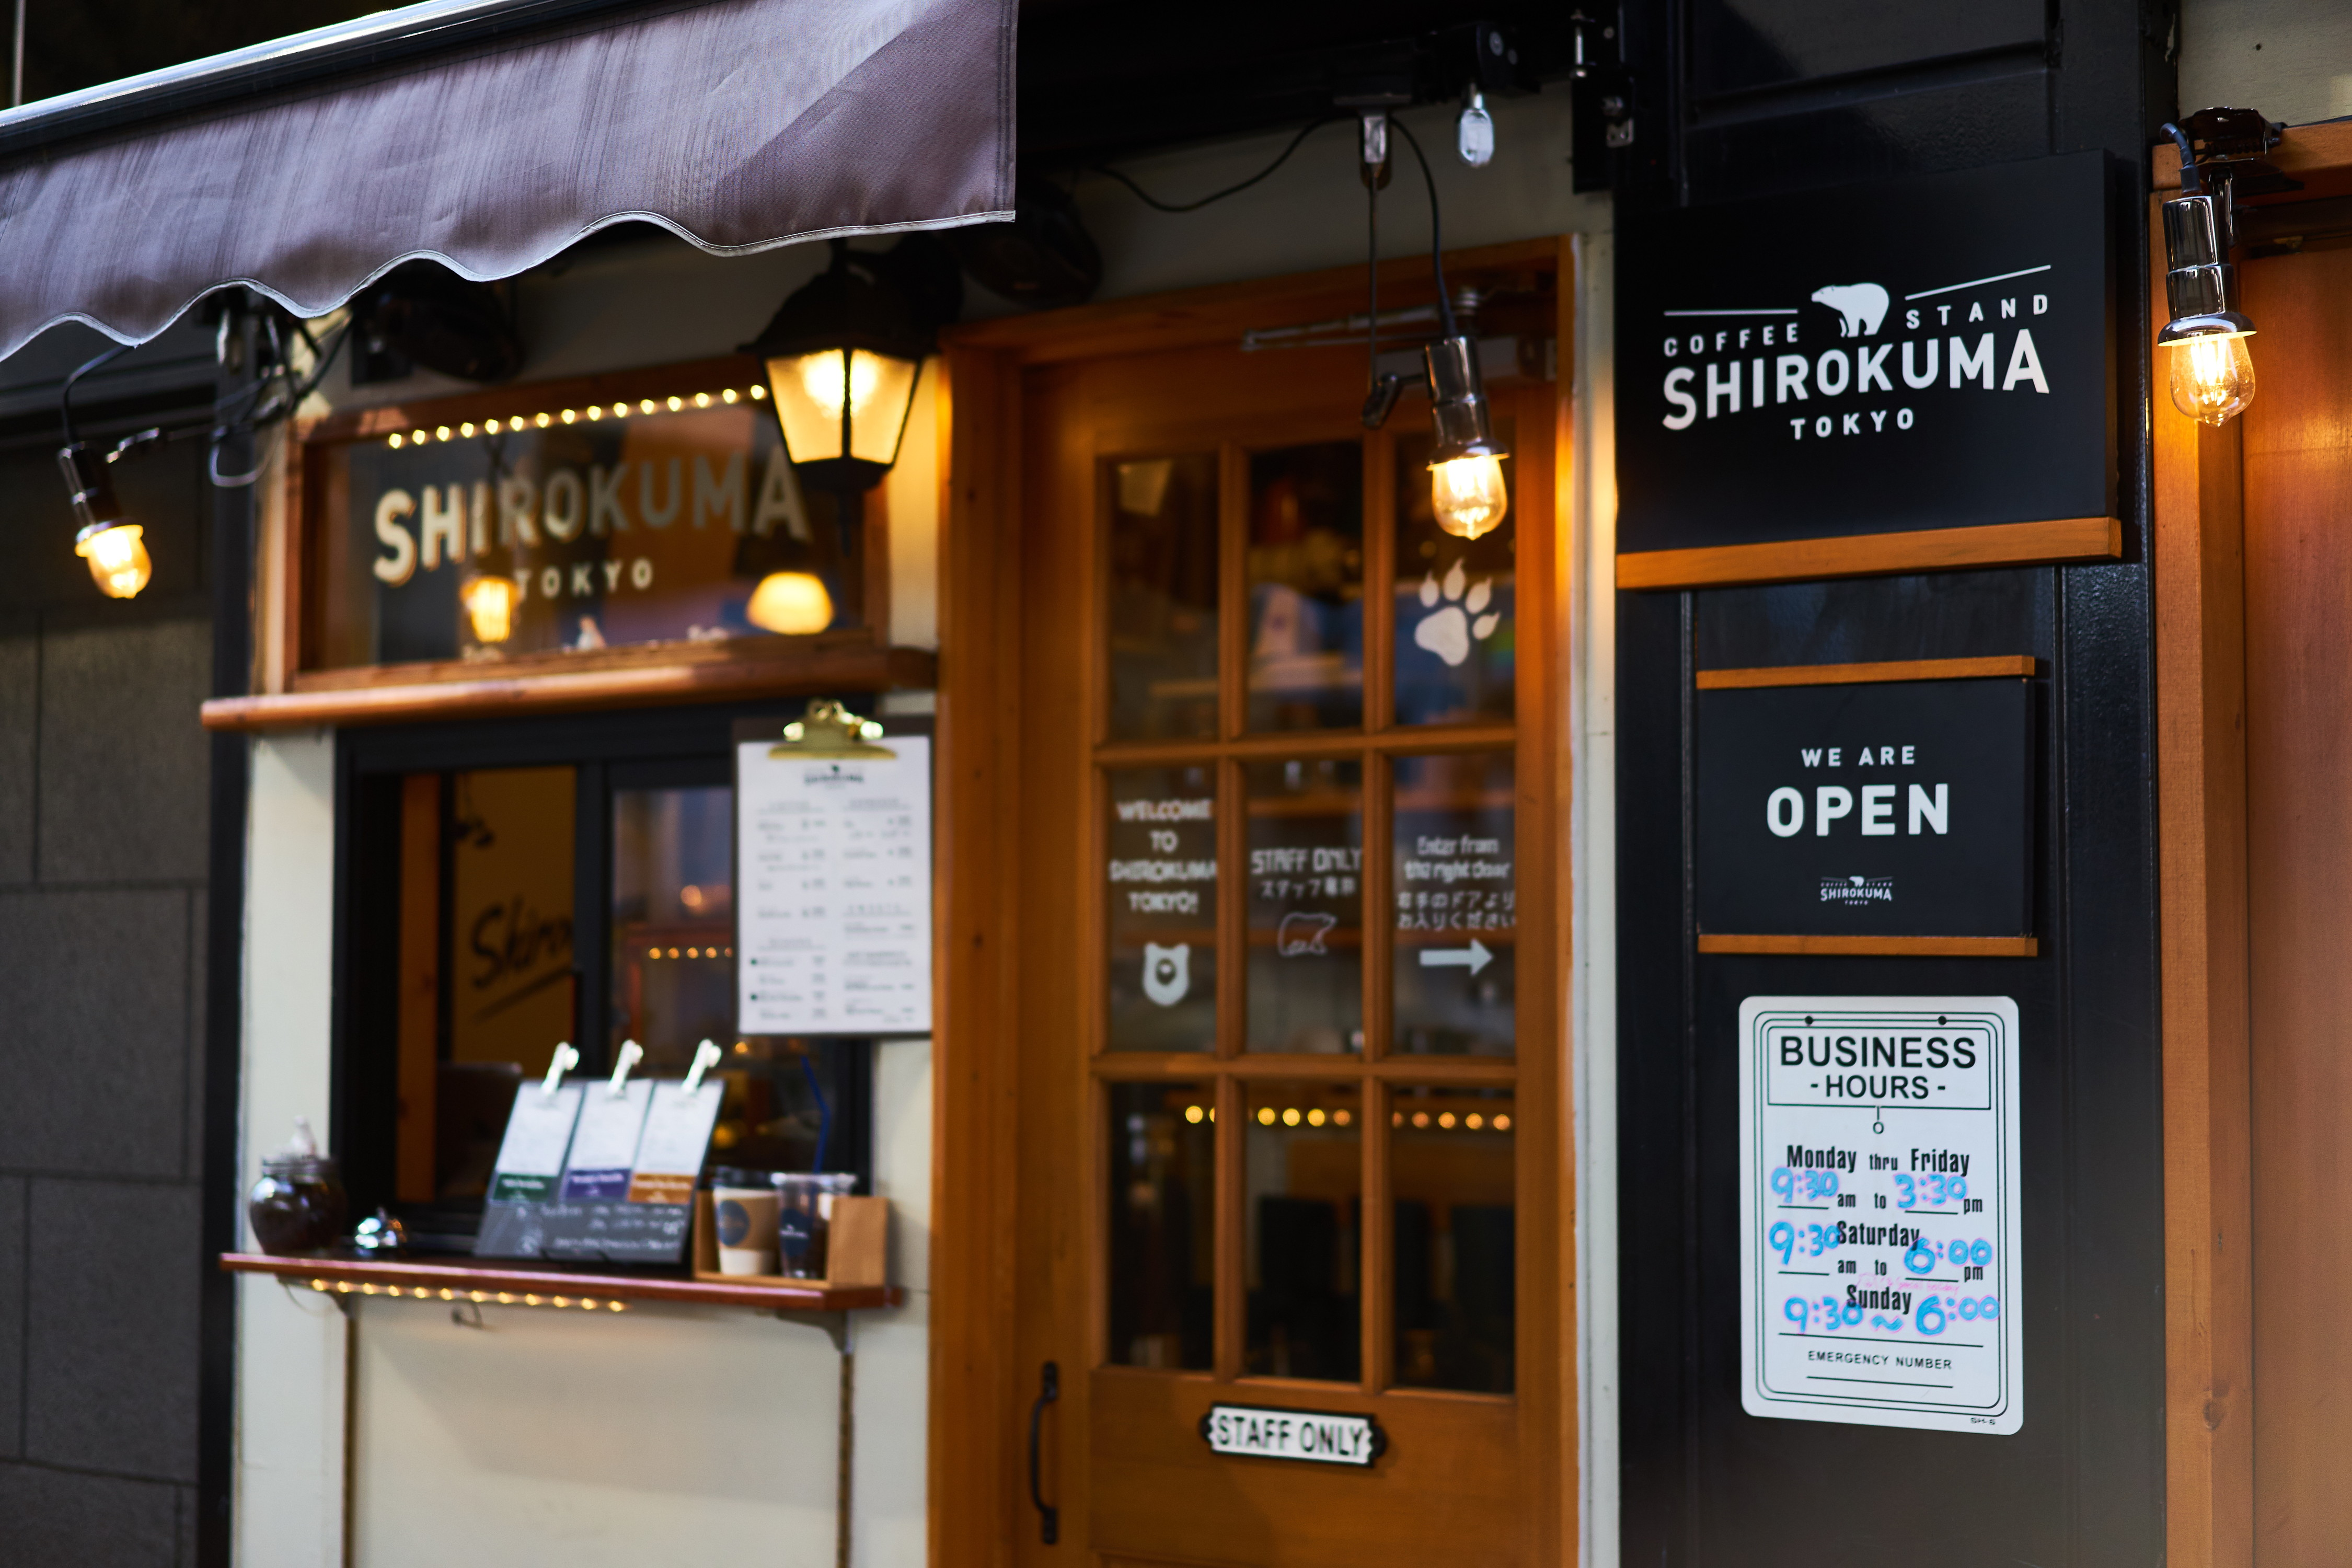 三軒茶屋 – Coffee stand Shirokuma Tokyo